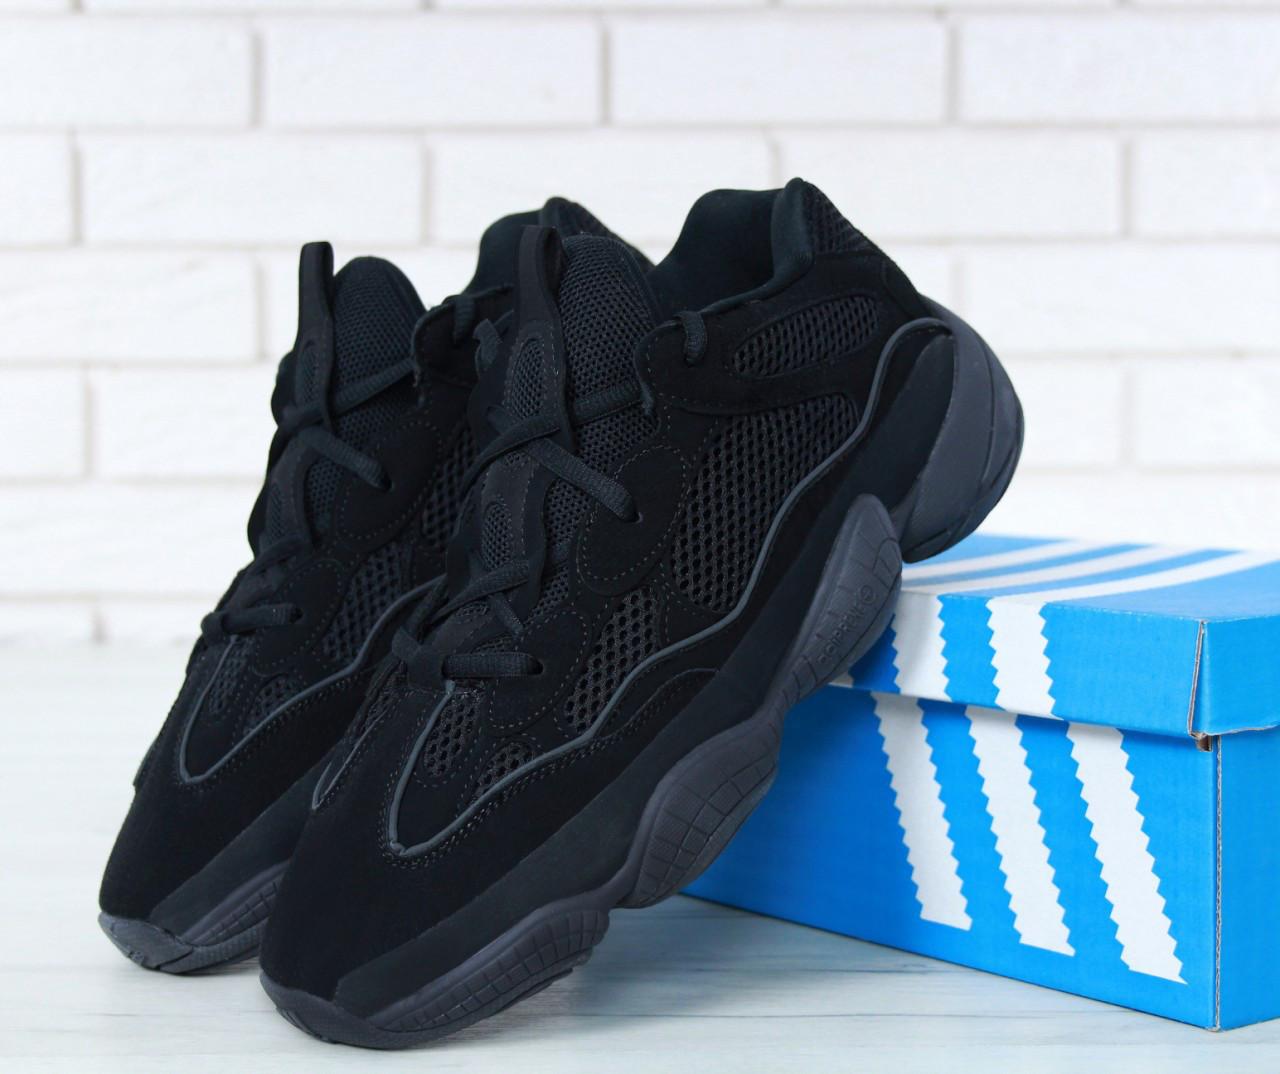 1e828d4644499 Мужские кроссовки Adidas Yeezy 500 Utility Black